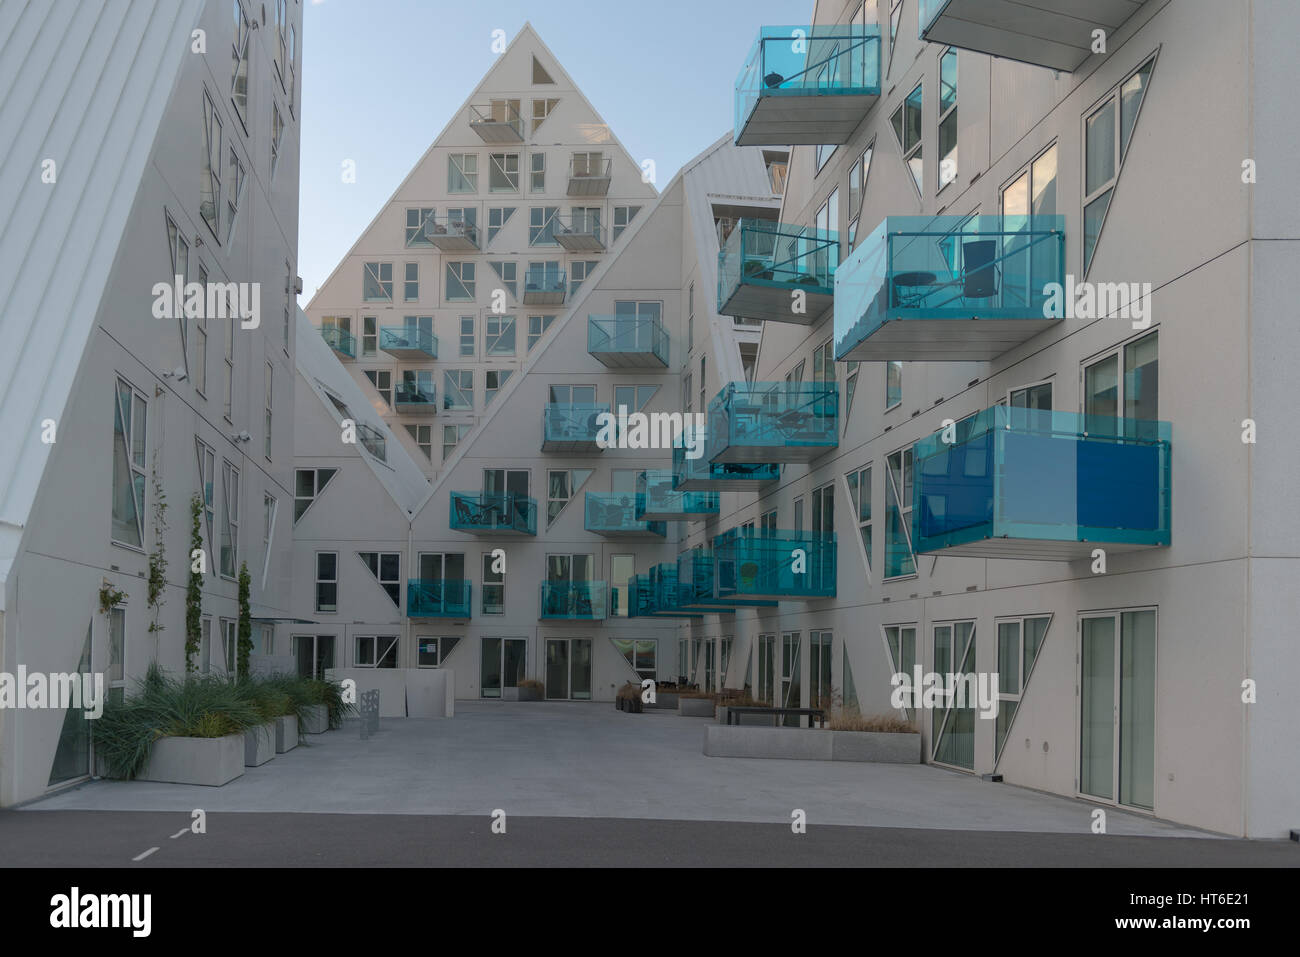 The Isbjerget (Ice  Berg) building in Aarhus Oe, Aaarhus East, an new city quarter at the habor front, Aarhus, North - Stock Image